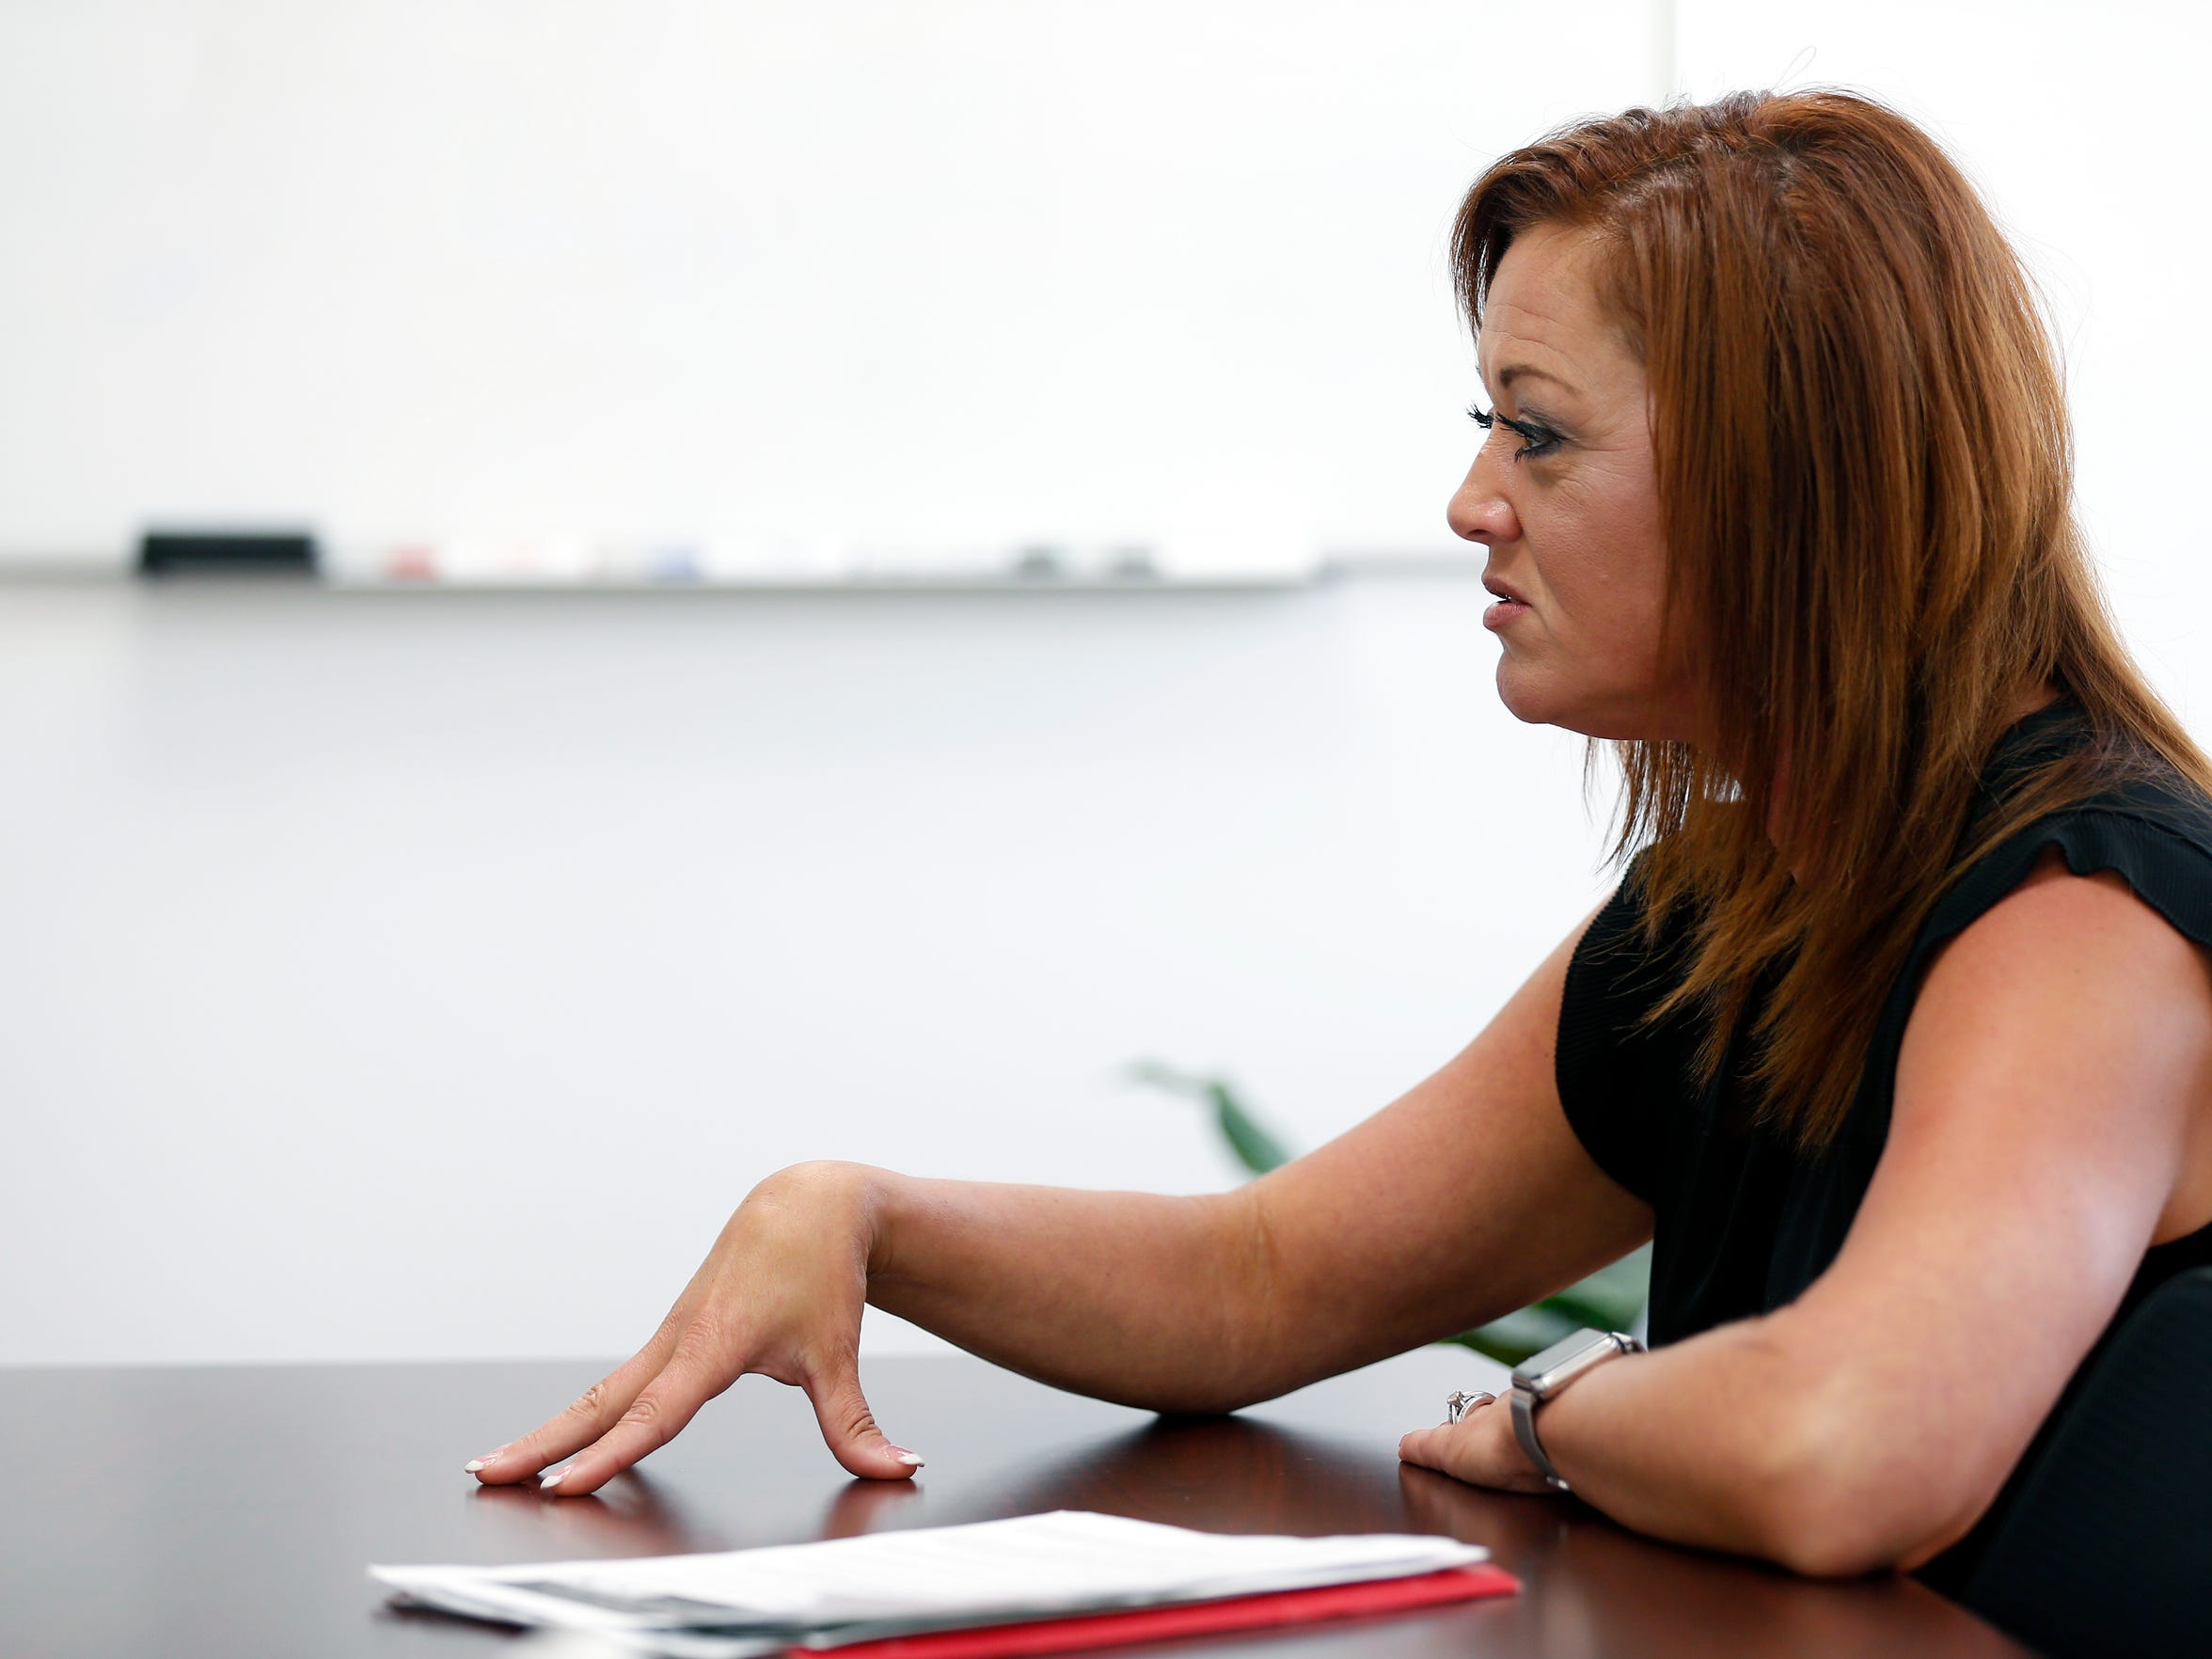 Community Mental Health Liaison Melissa Daugherty talks